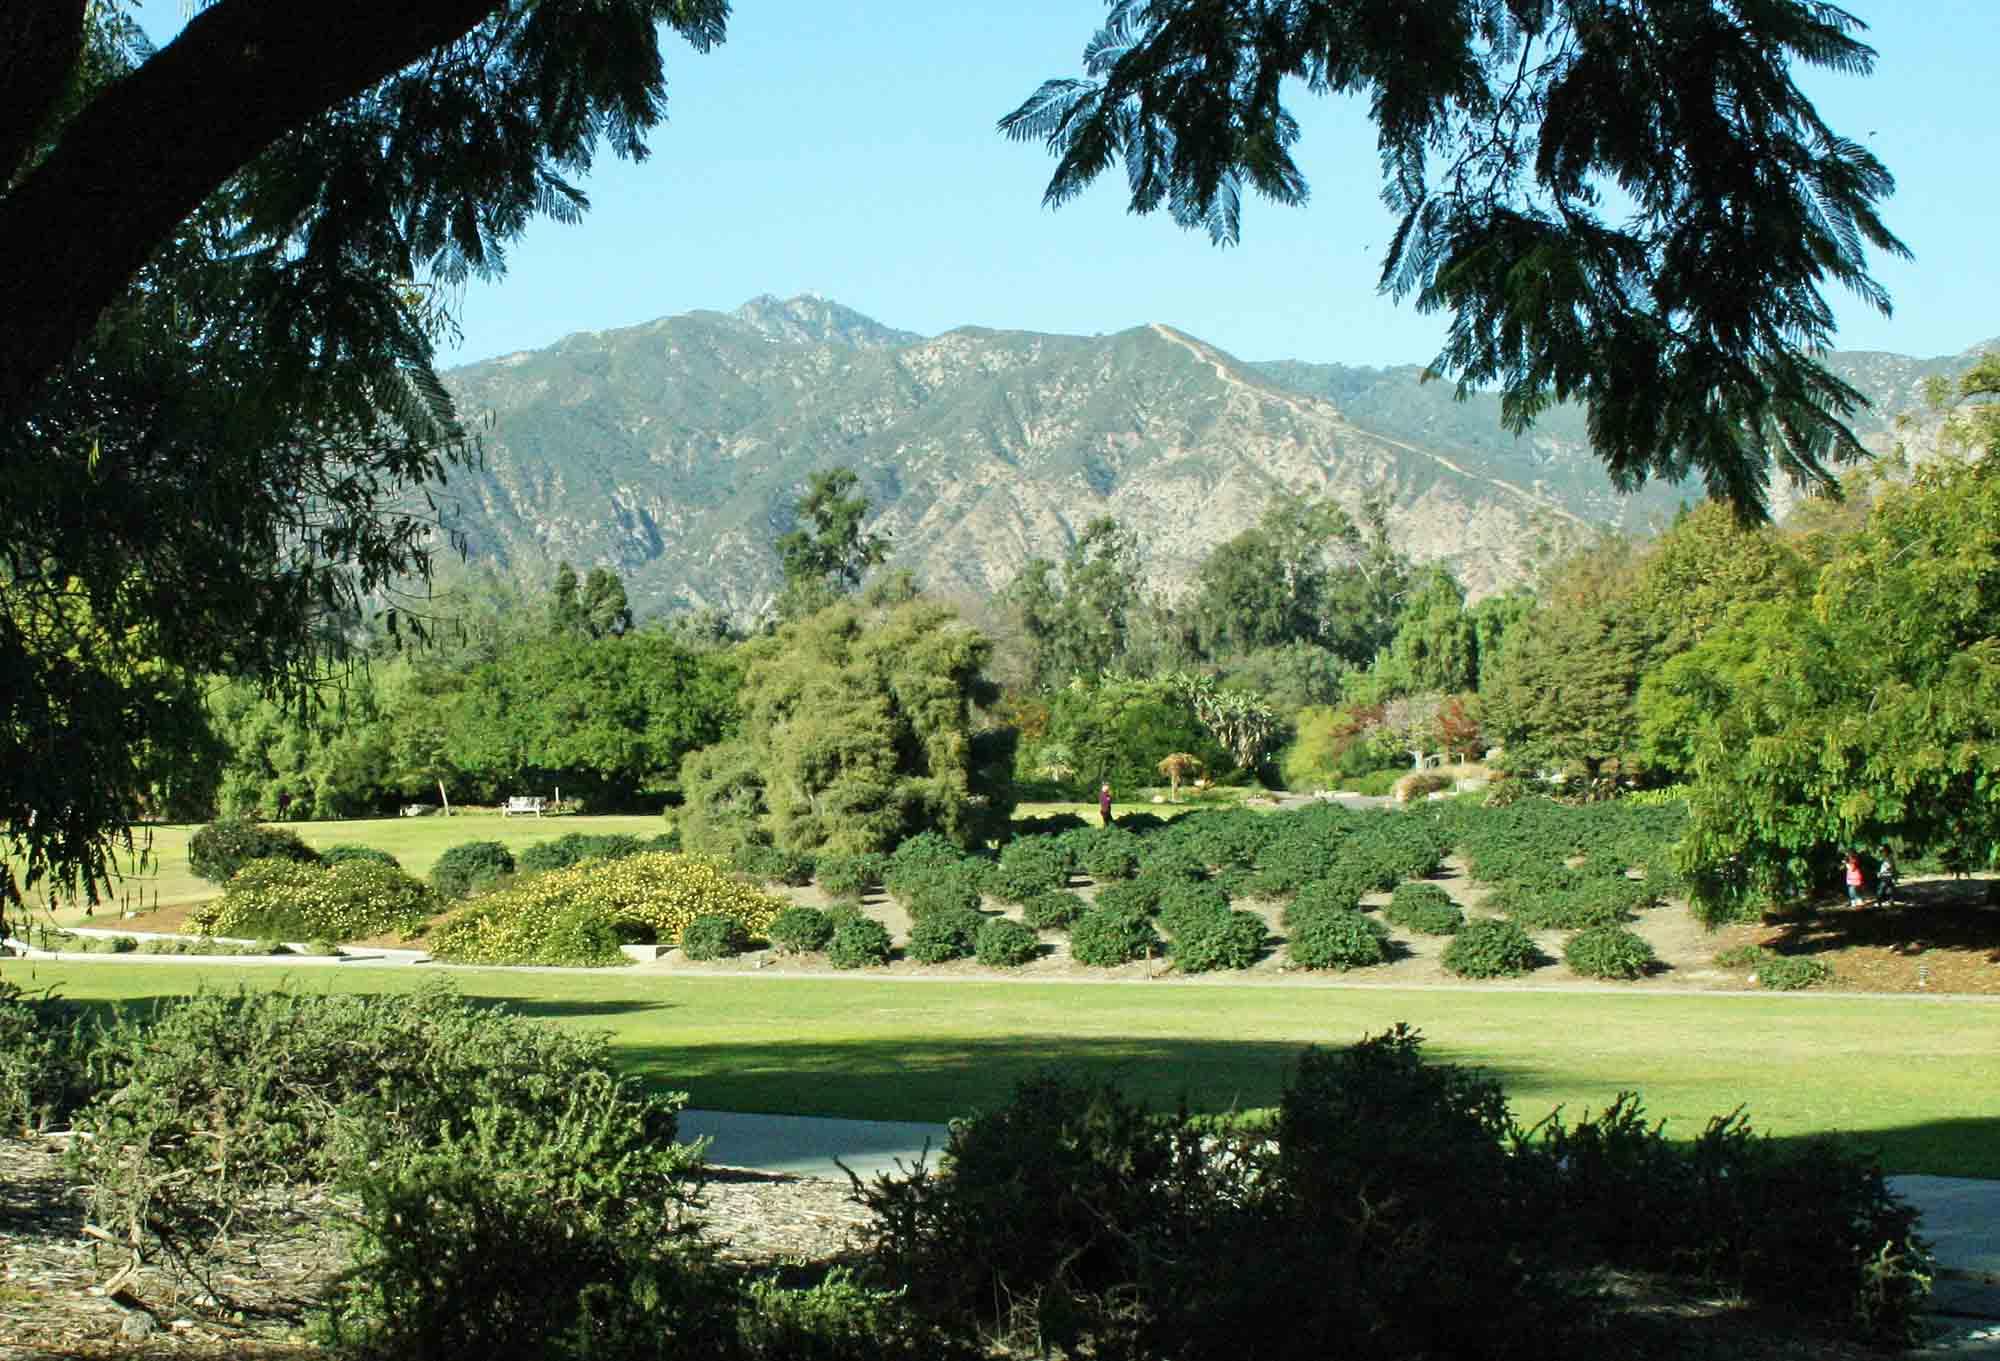 Botanical Gardens Los Angeles Los Angeles Arboretum